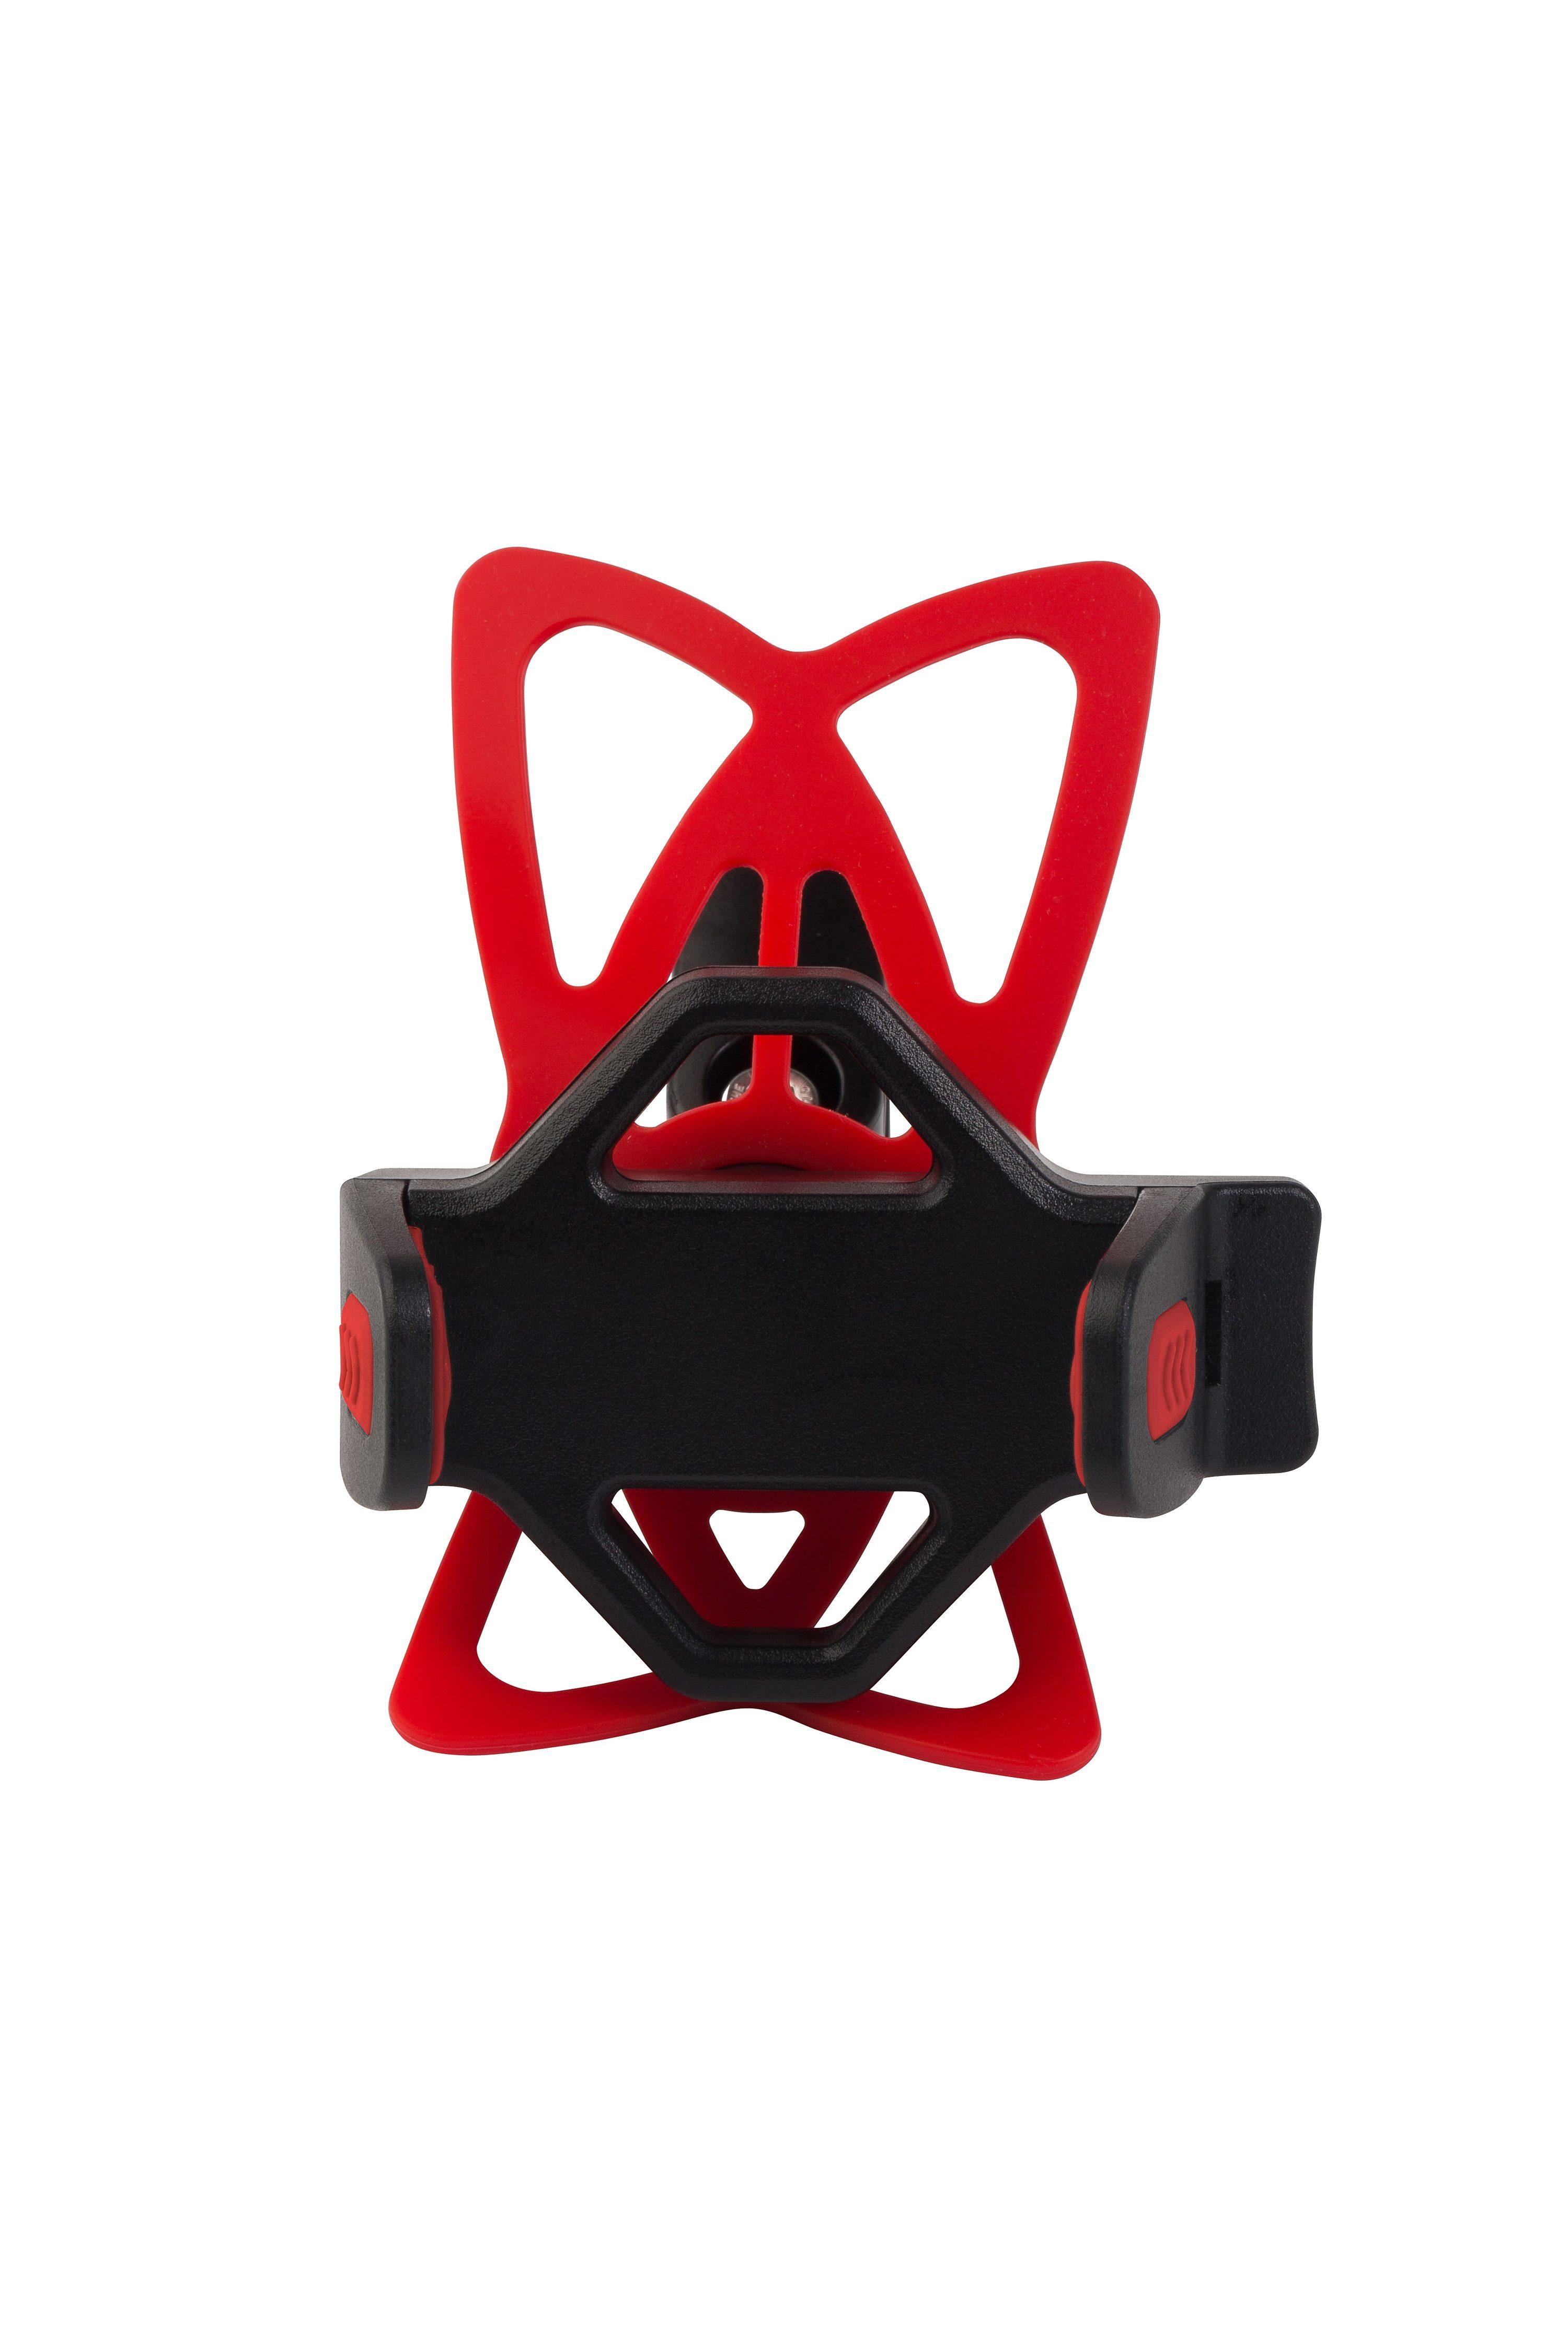 OSOMOUNT Smartphone Halterung »Cyclomount schwarz«